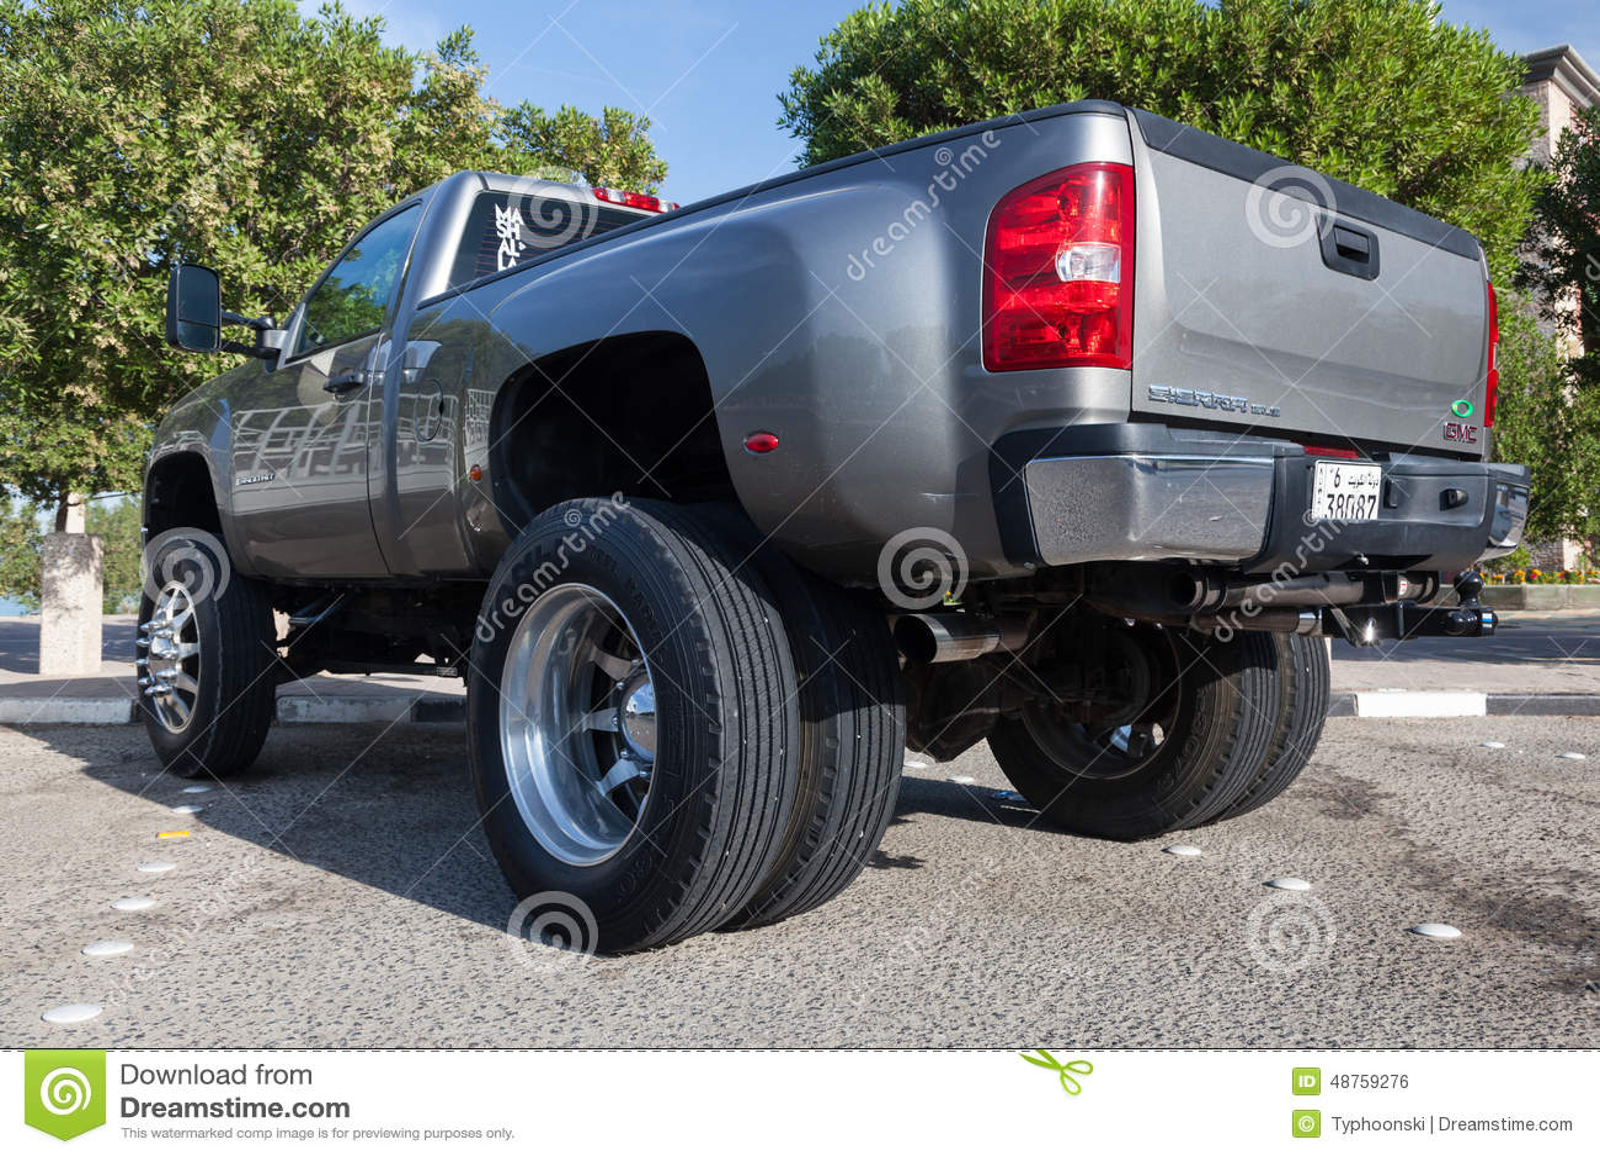 Gmc sierra pickup truck in kuwait editorial photo image for Motor city gmc used trucks